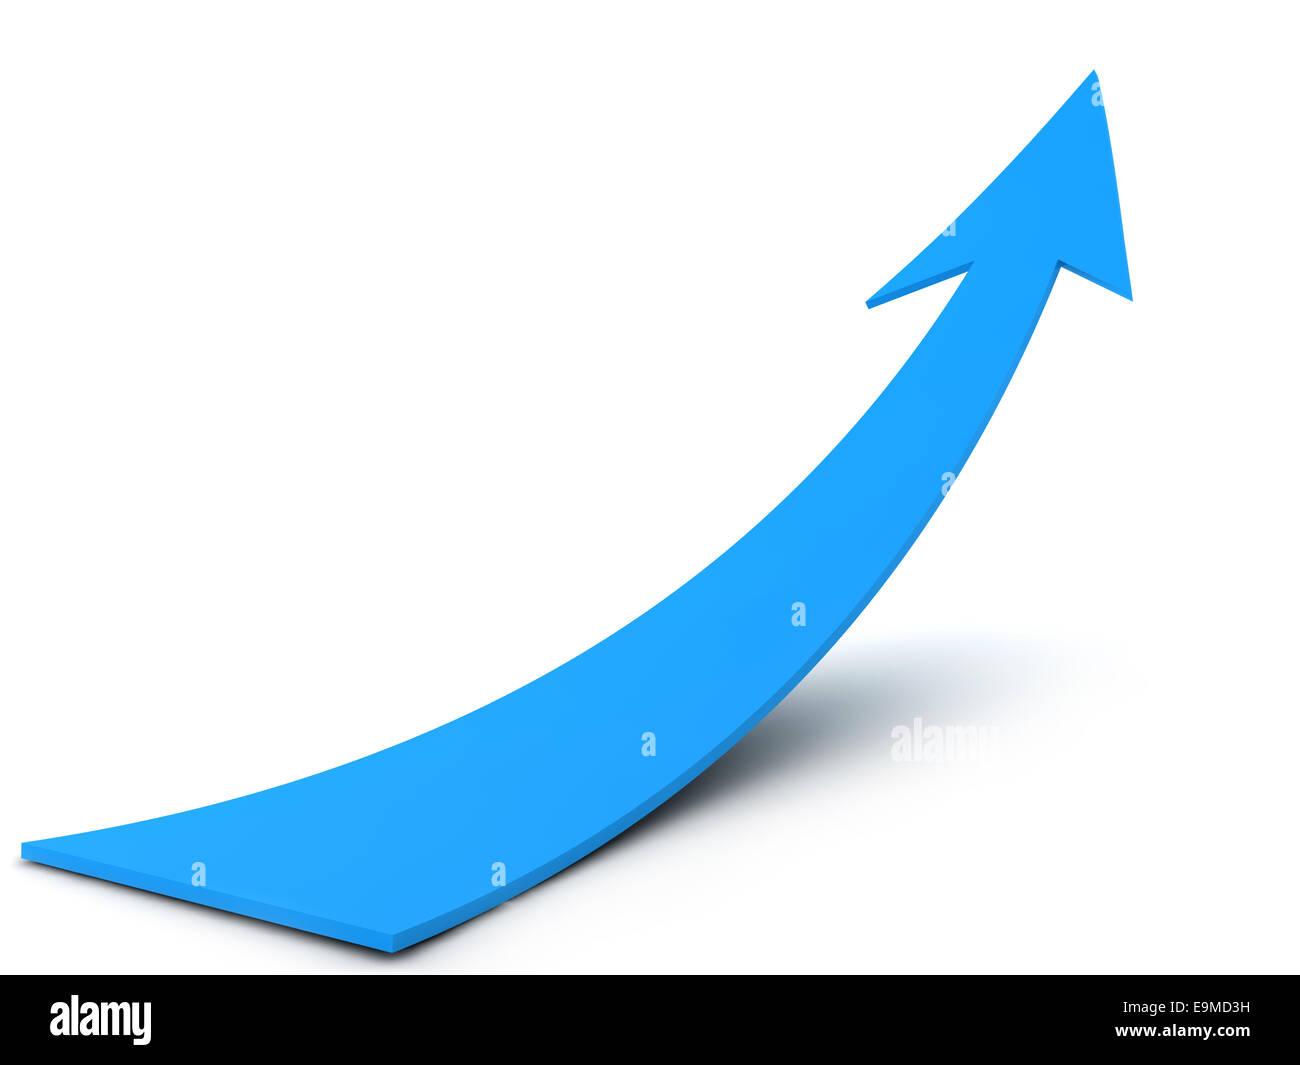 blue arrow Sign isolated on white background.digitally generated image. - Stock Image